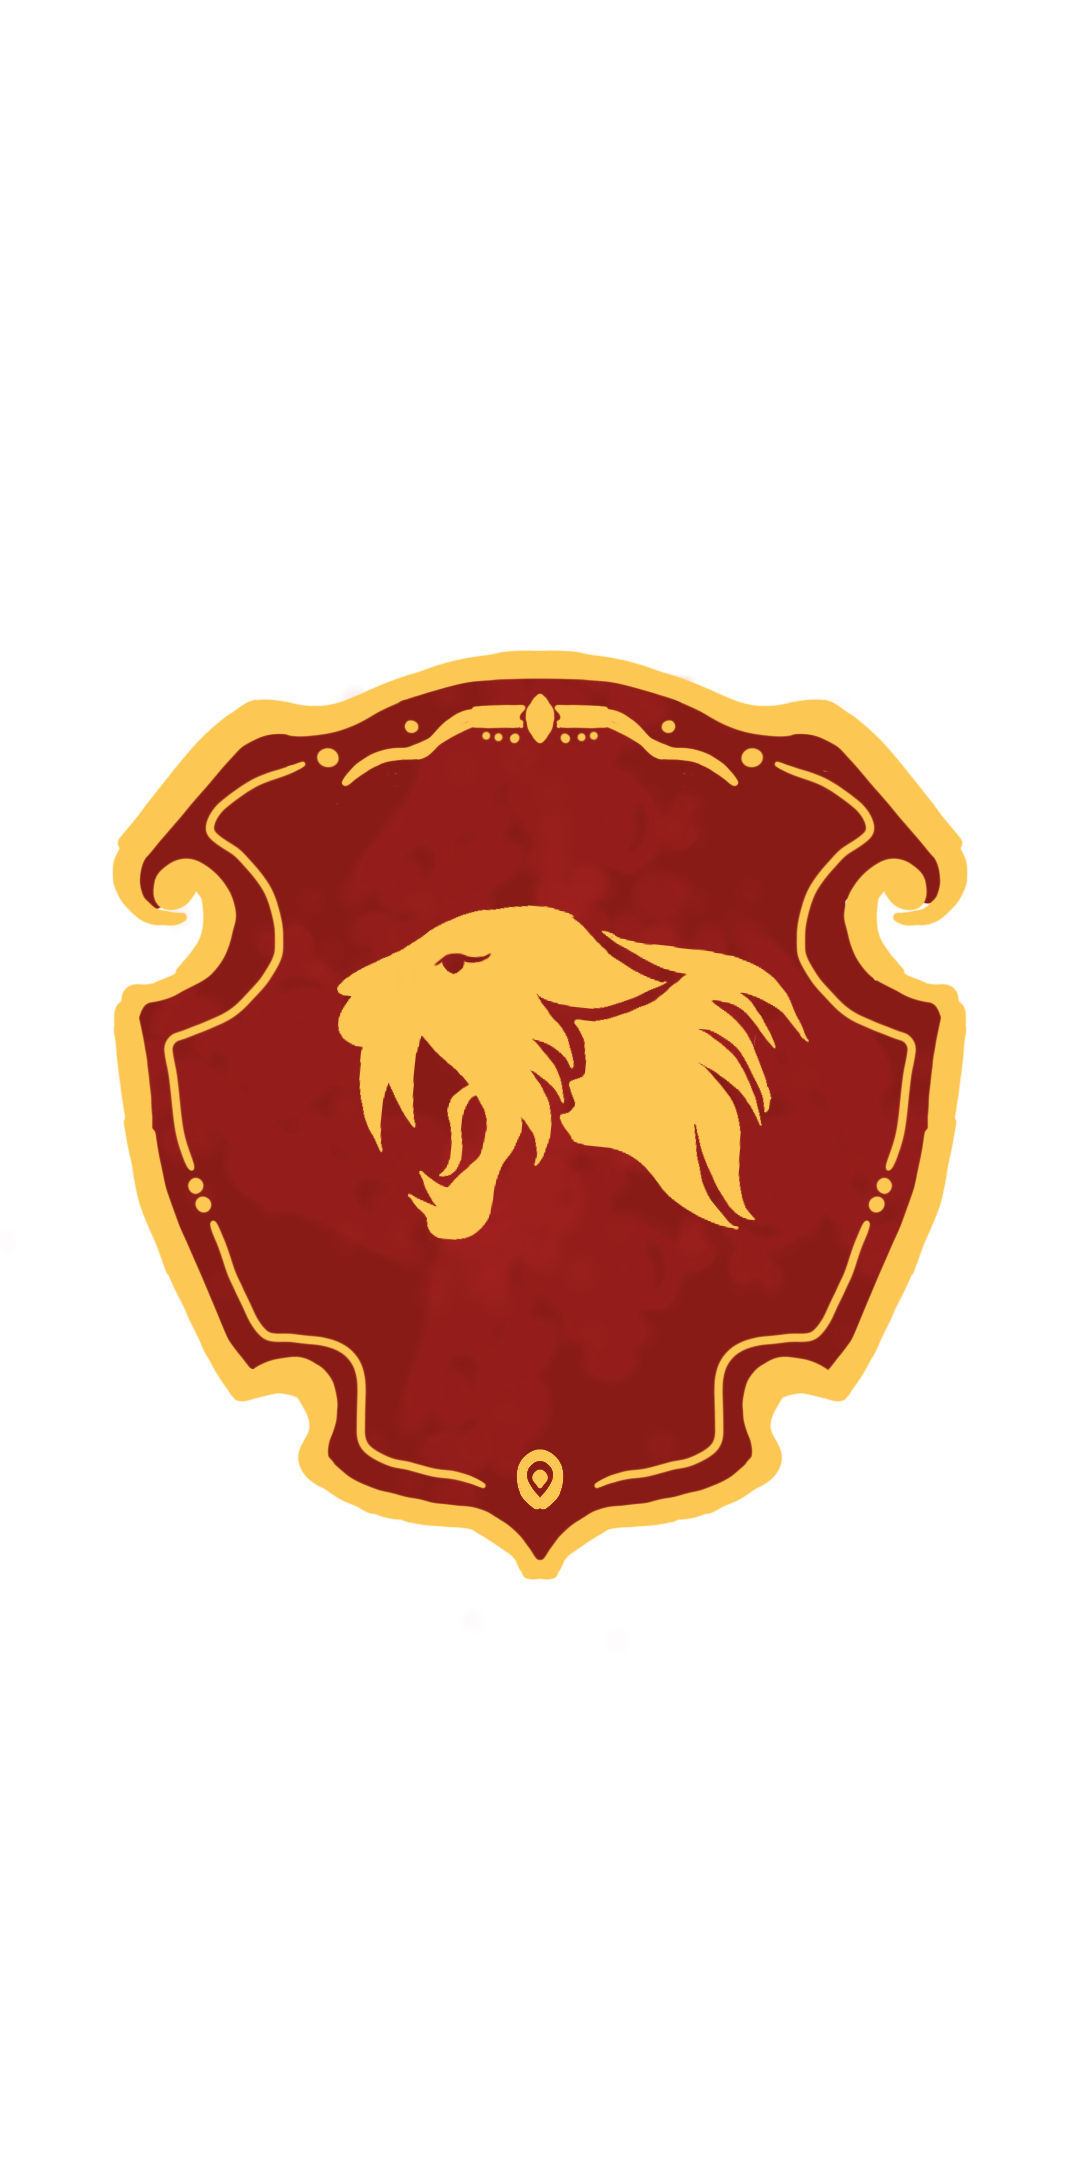 Chola tiger logo